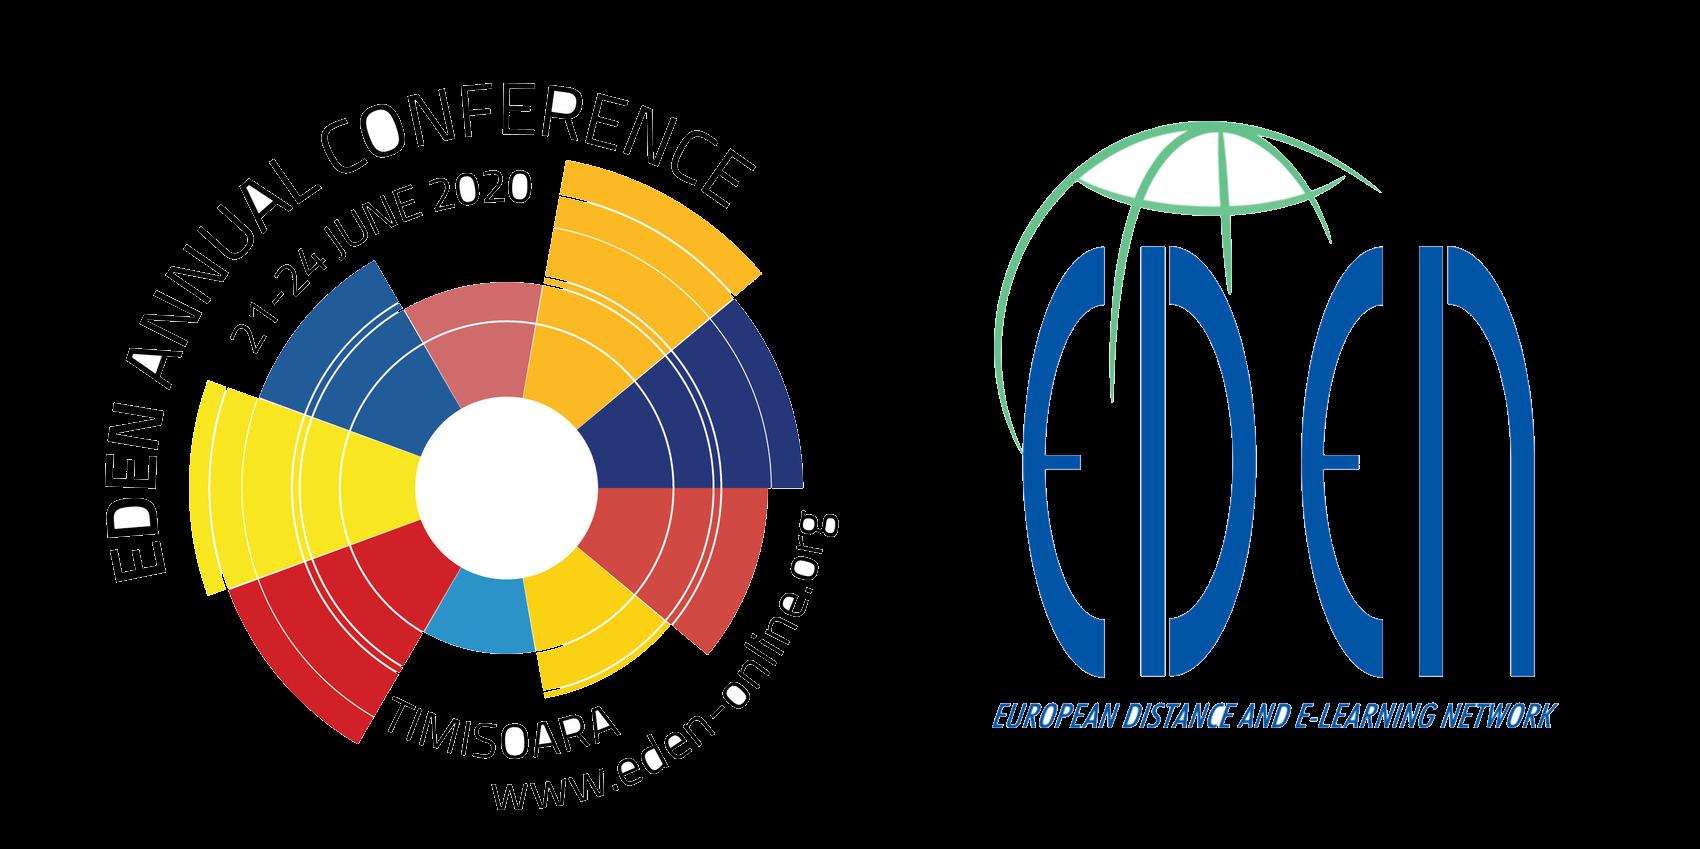 Logo: EDEN 2020 Annual Conference June 21-24, Politehnica University of Timisoara, Romania